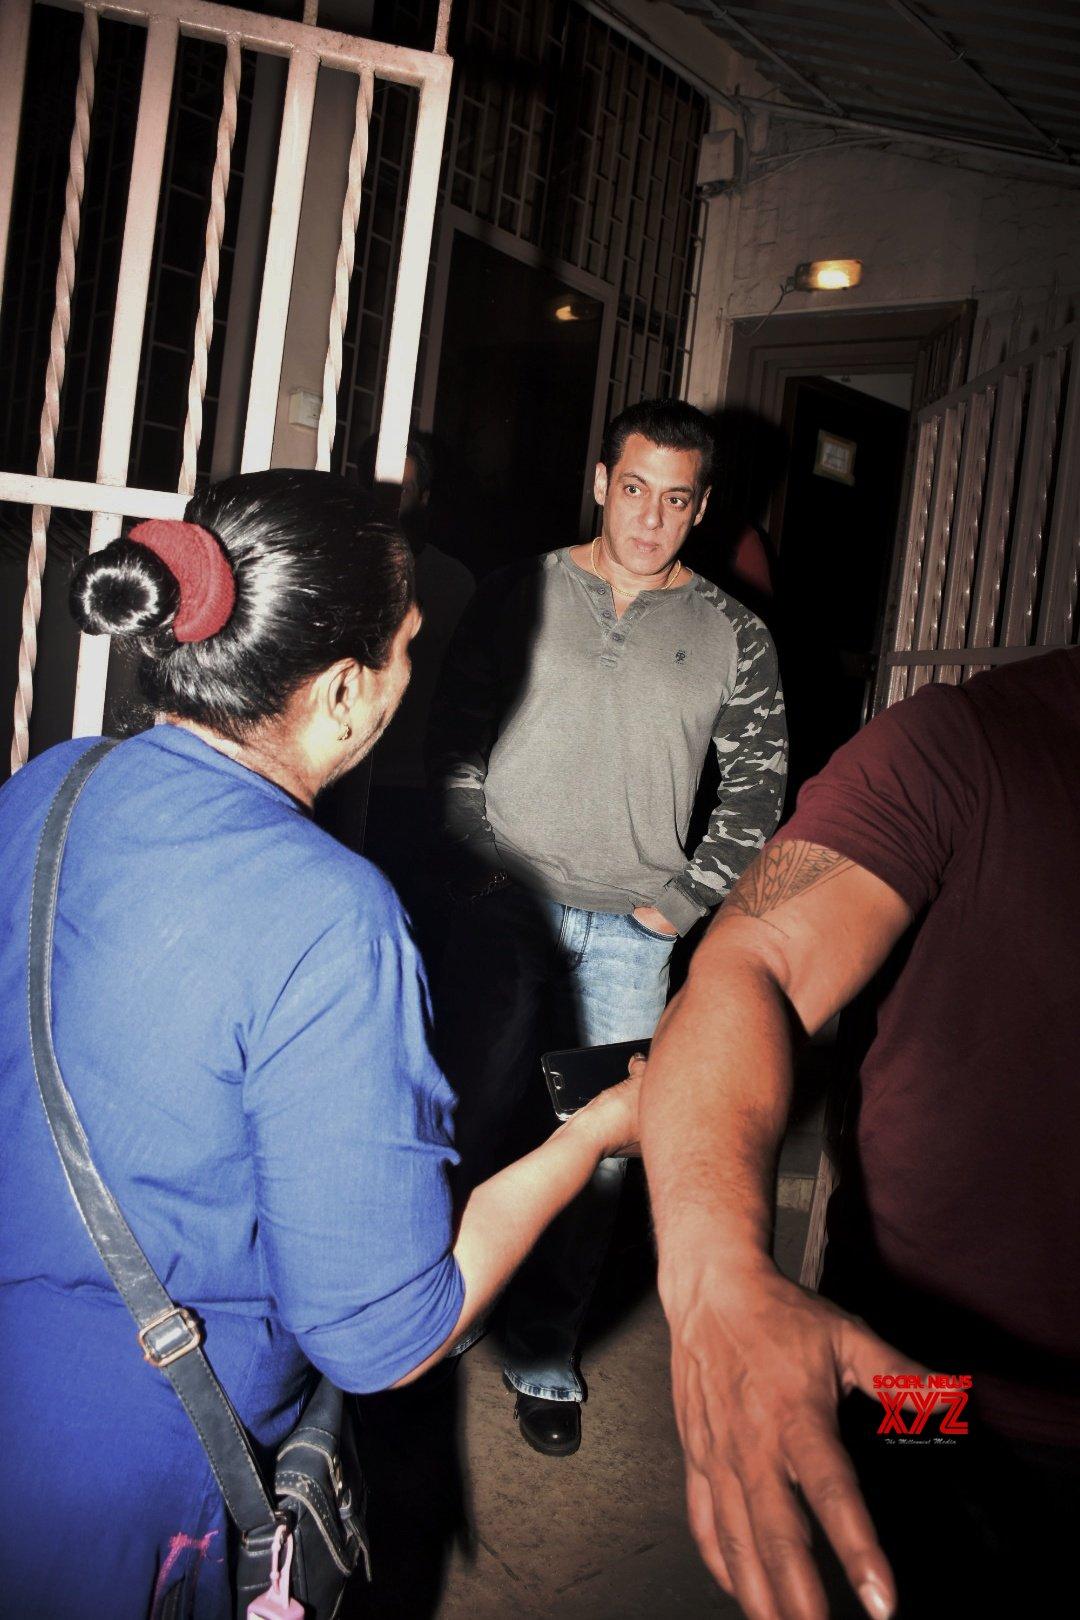 Salman Khan At Dubbing Studio In Bandra - Gallery